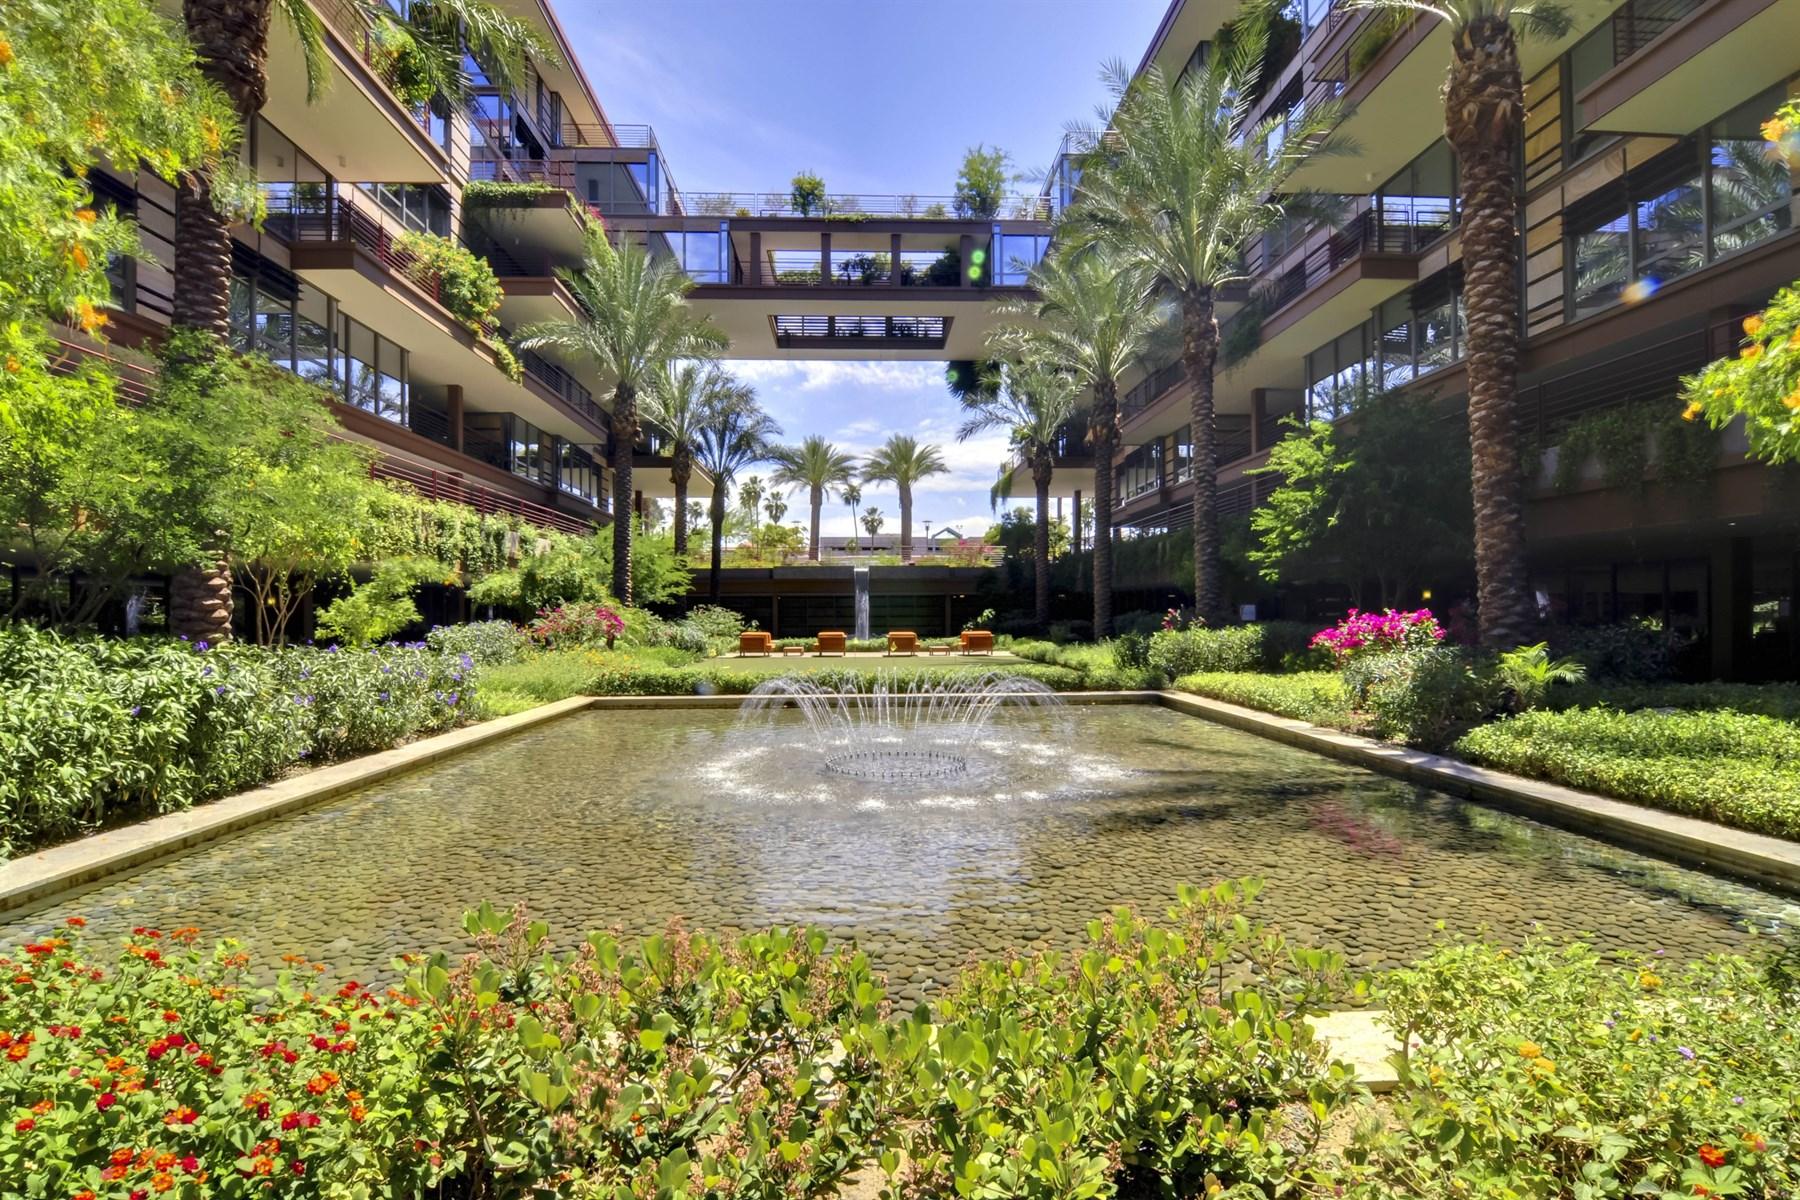 Căn hộ vì Bán tại Stunning Luxurious Four Bedroom Unit At Optima Camelview 7167 E Rancho Vista Drive #4014 Scottsdale, Arizona 85251 Hoa Kỳ